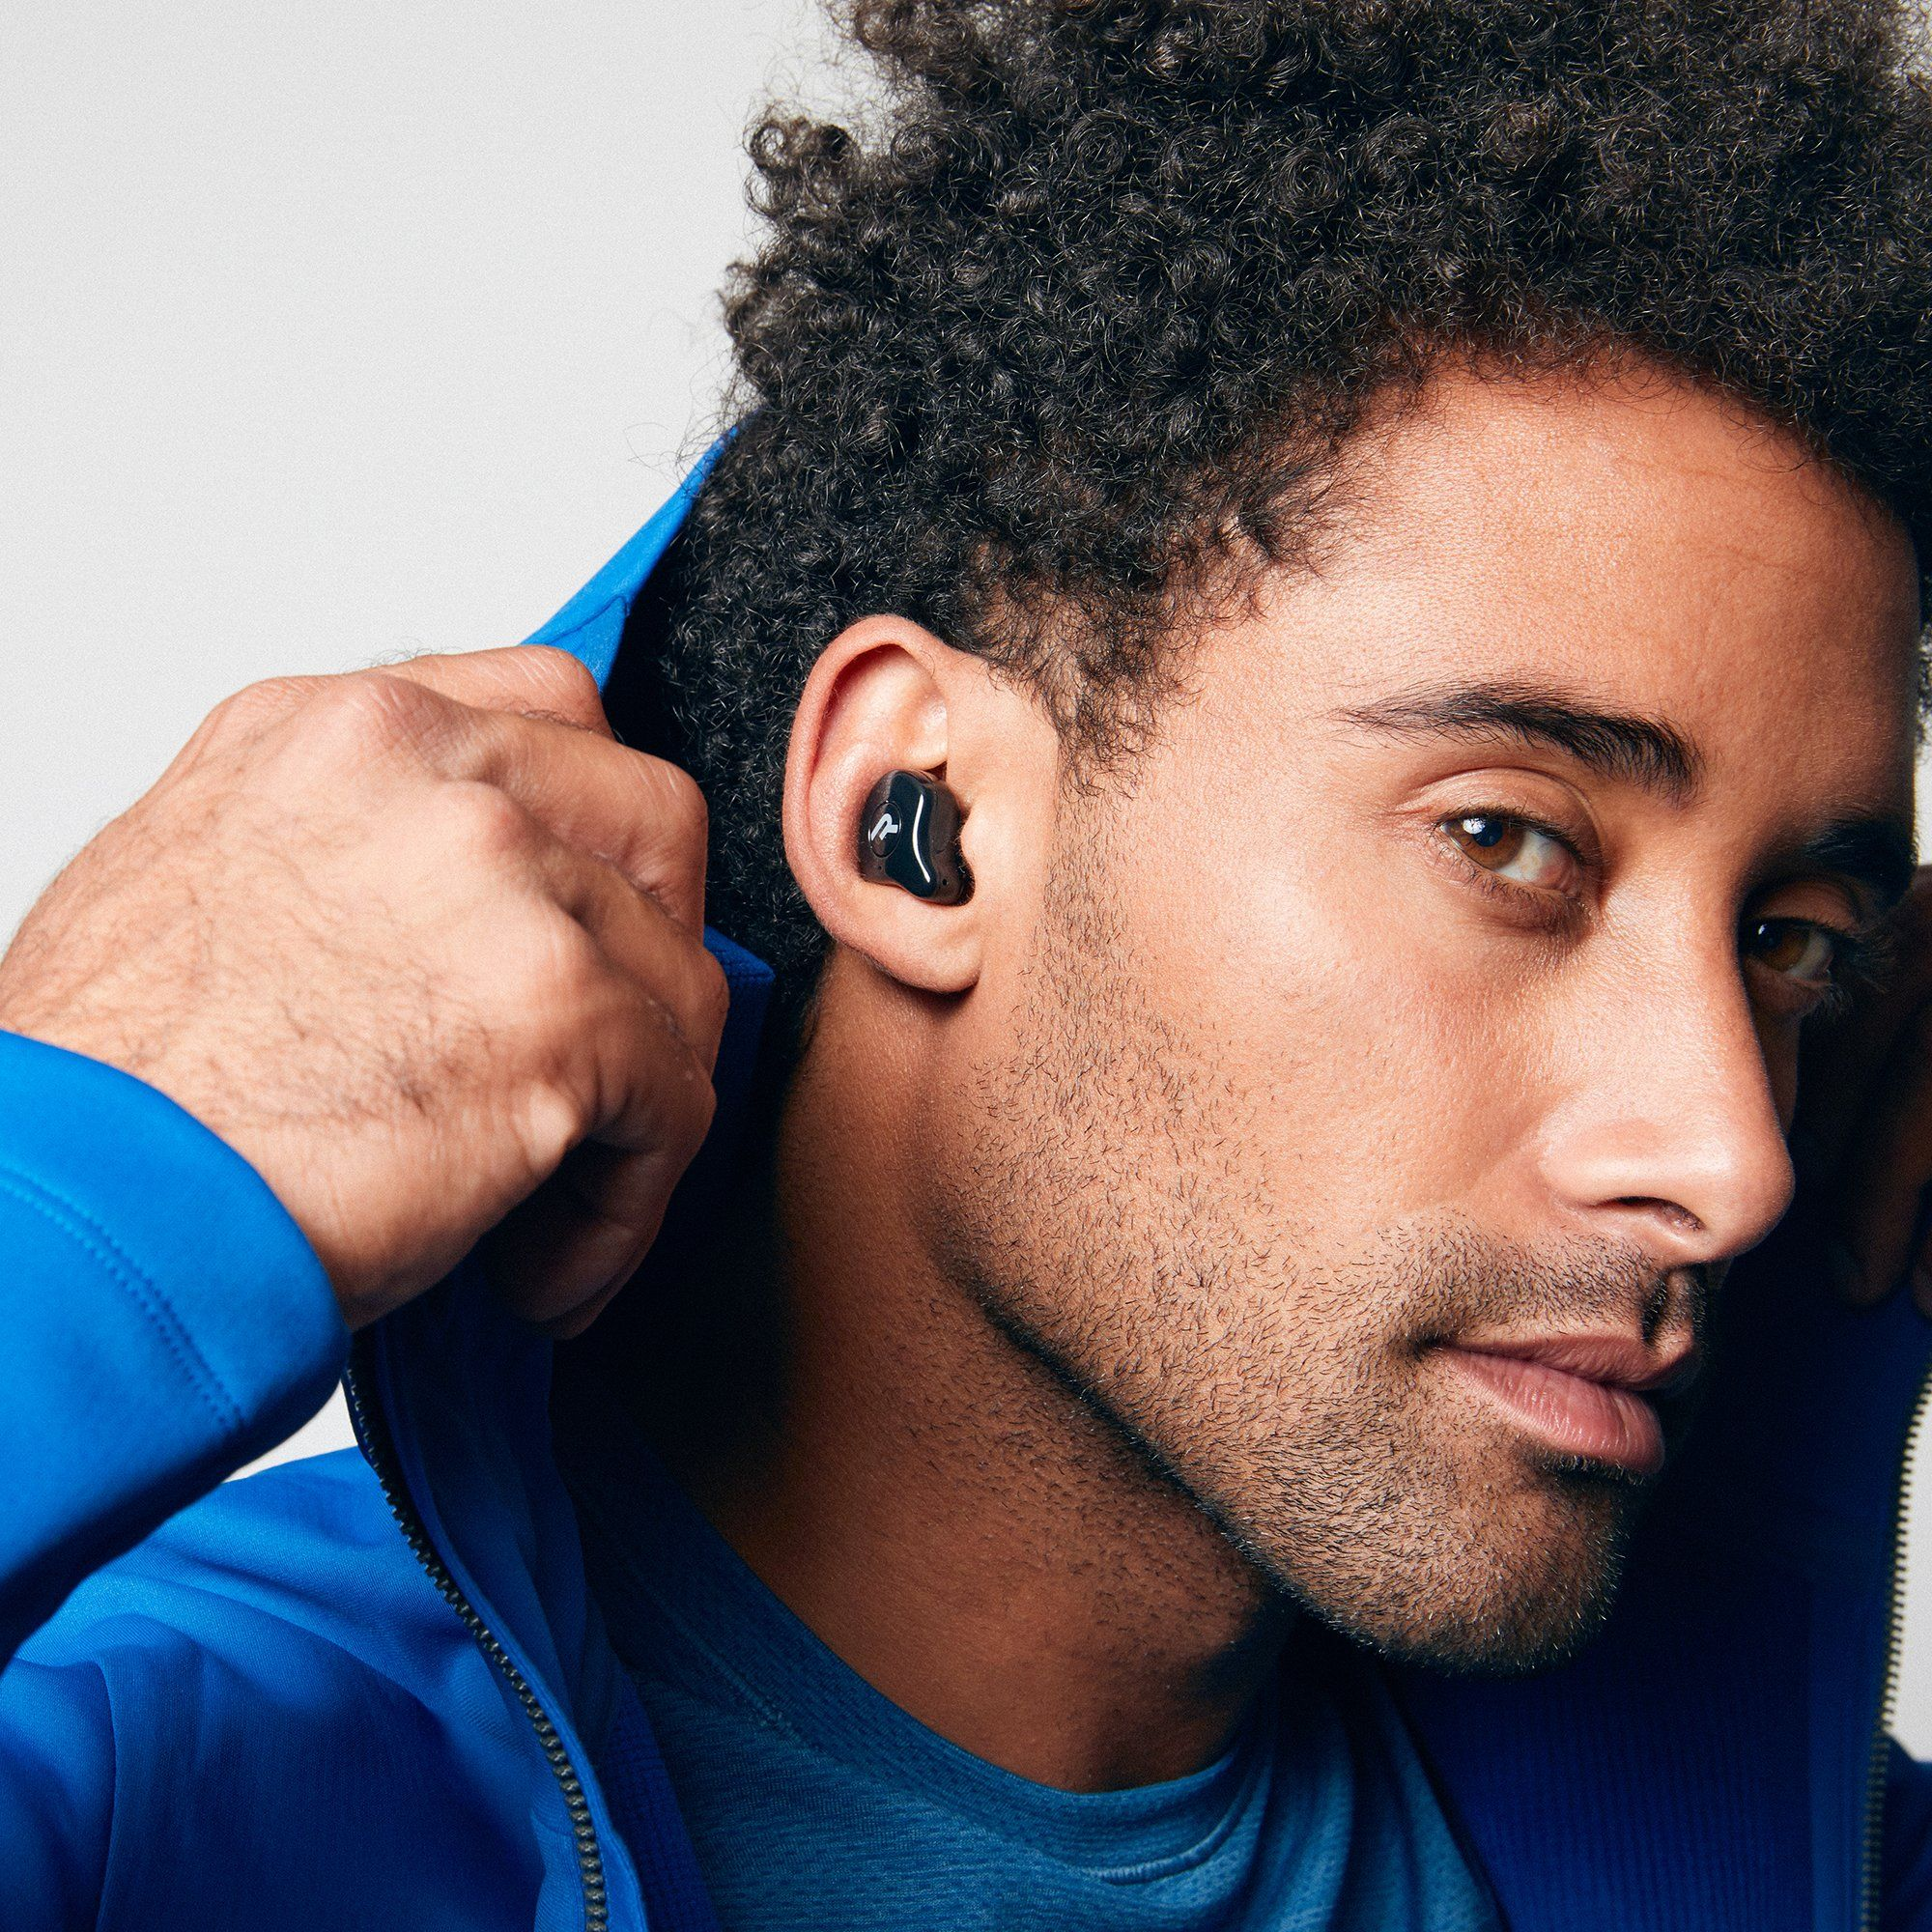 The Everyday E25 Earbuds Earbuds Wireless Audio Wireless Earphones